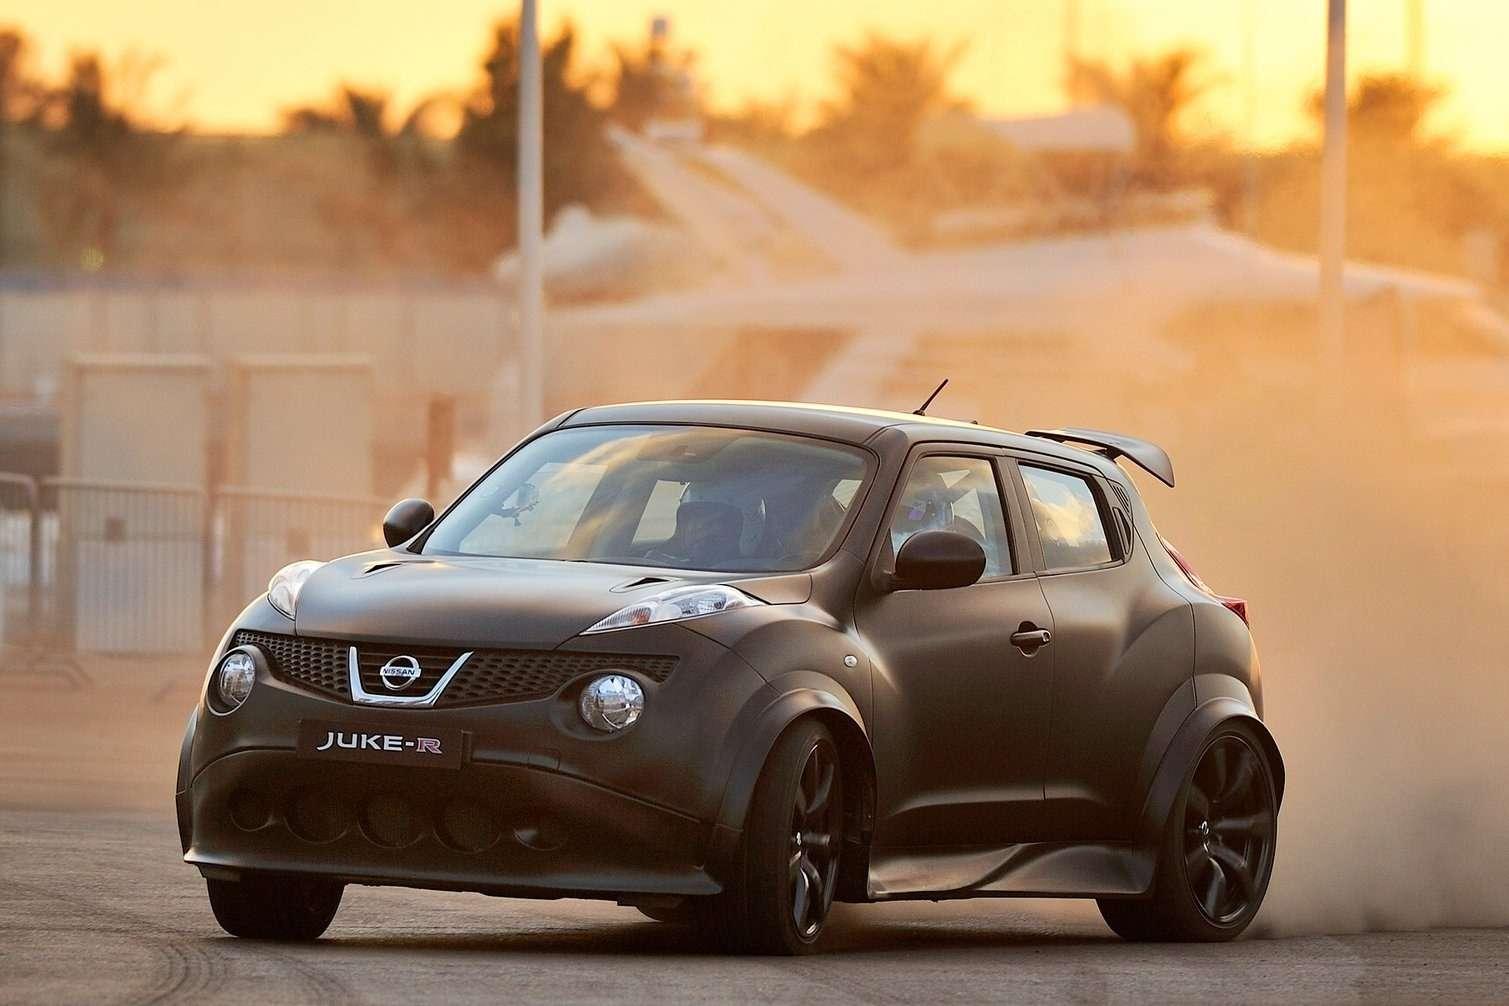 Nissan-Juke-R_Concept_2011_1600x1200_wallpaper_04